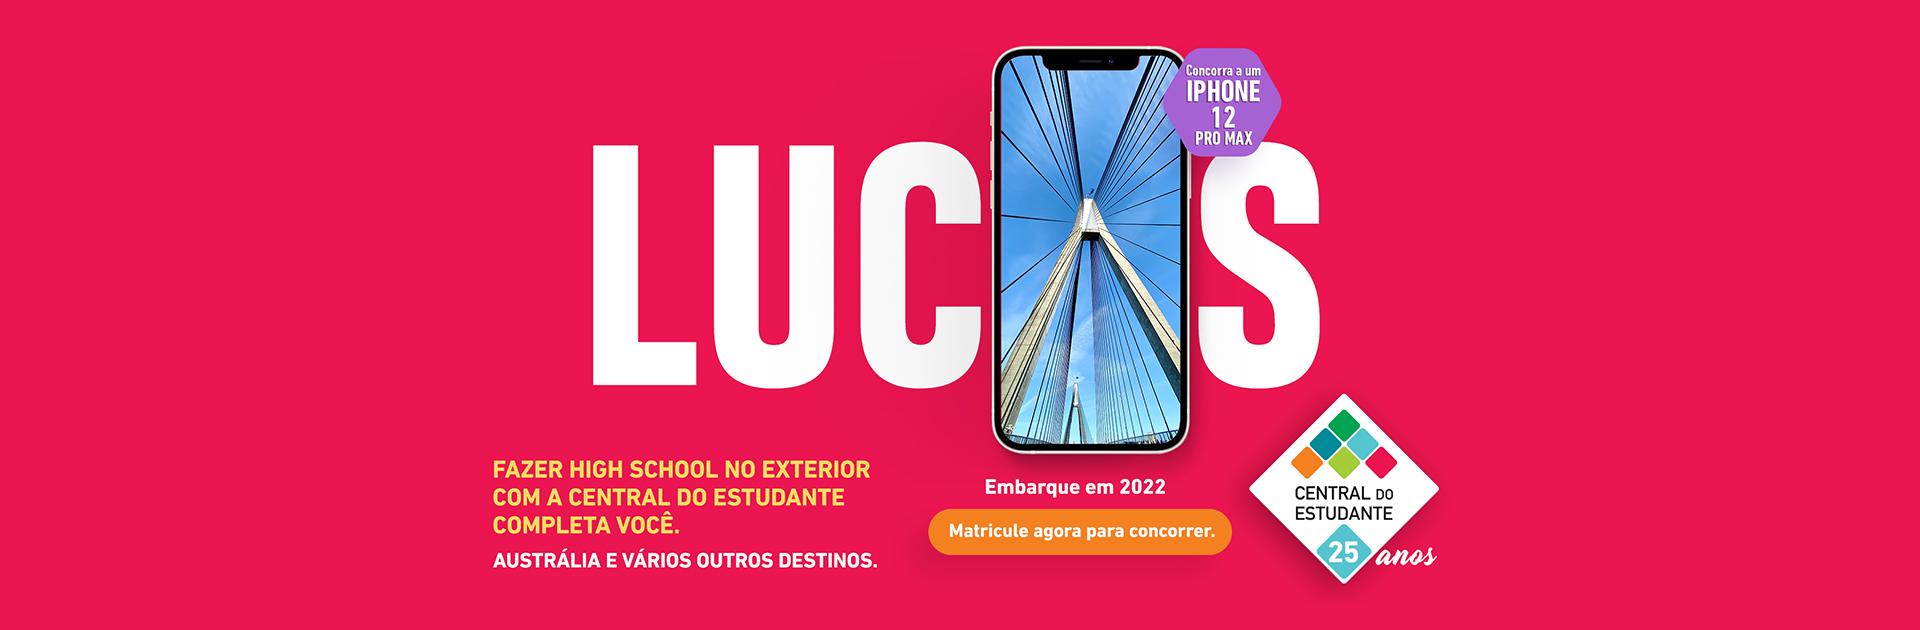 10185_central_estudantes_campanha2022_Alunos_lucas